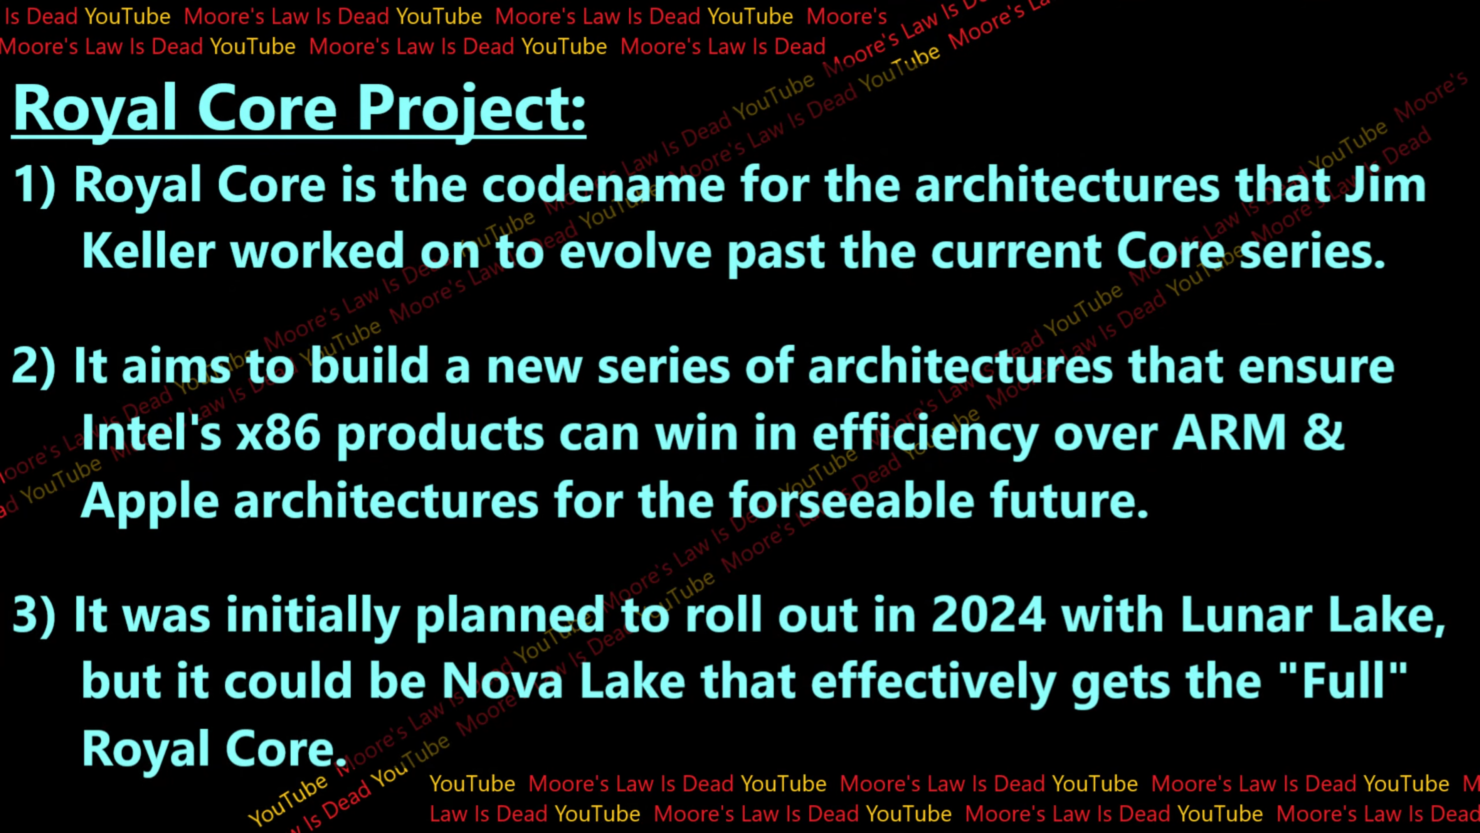 intel-royal-core-architecture-arrow-lake-lunar-lake-nova-lake-with-lion-cove-and-panther-cove-cores-_1